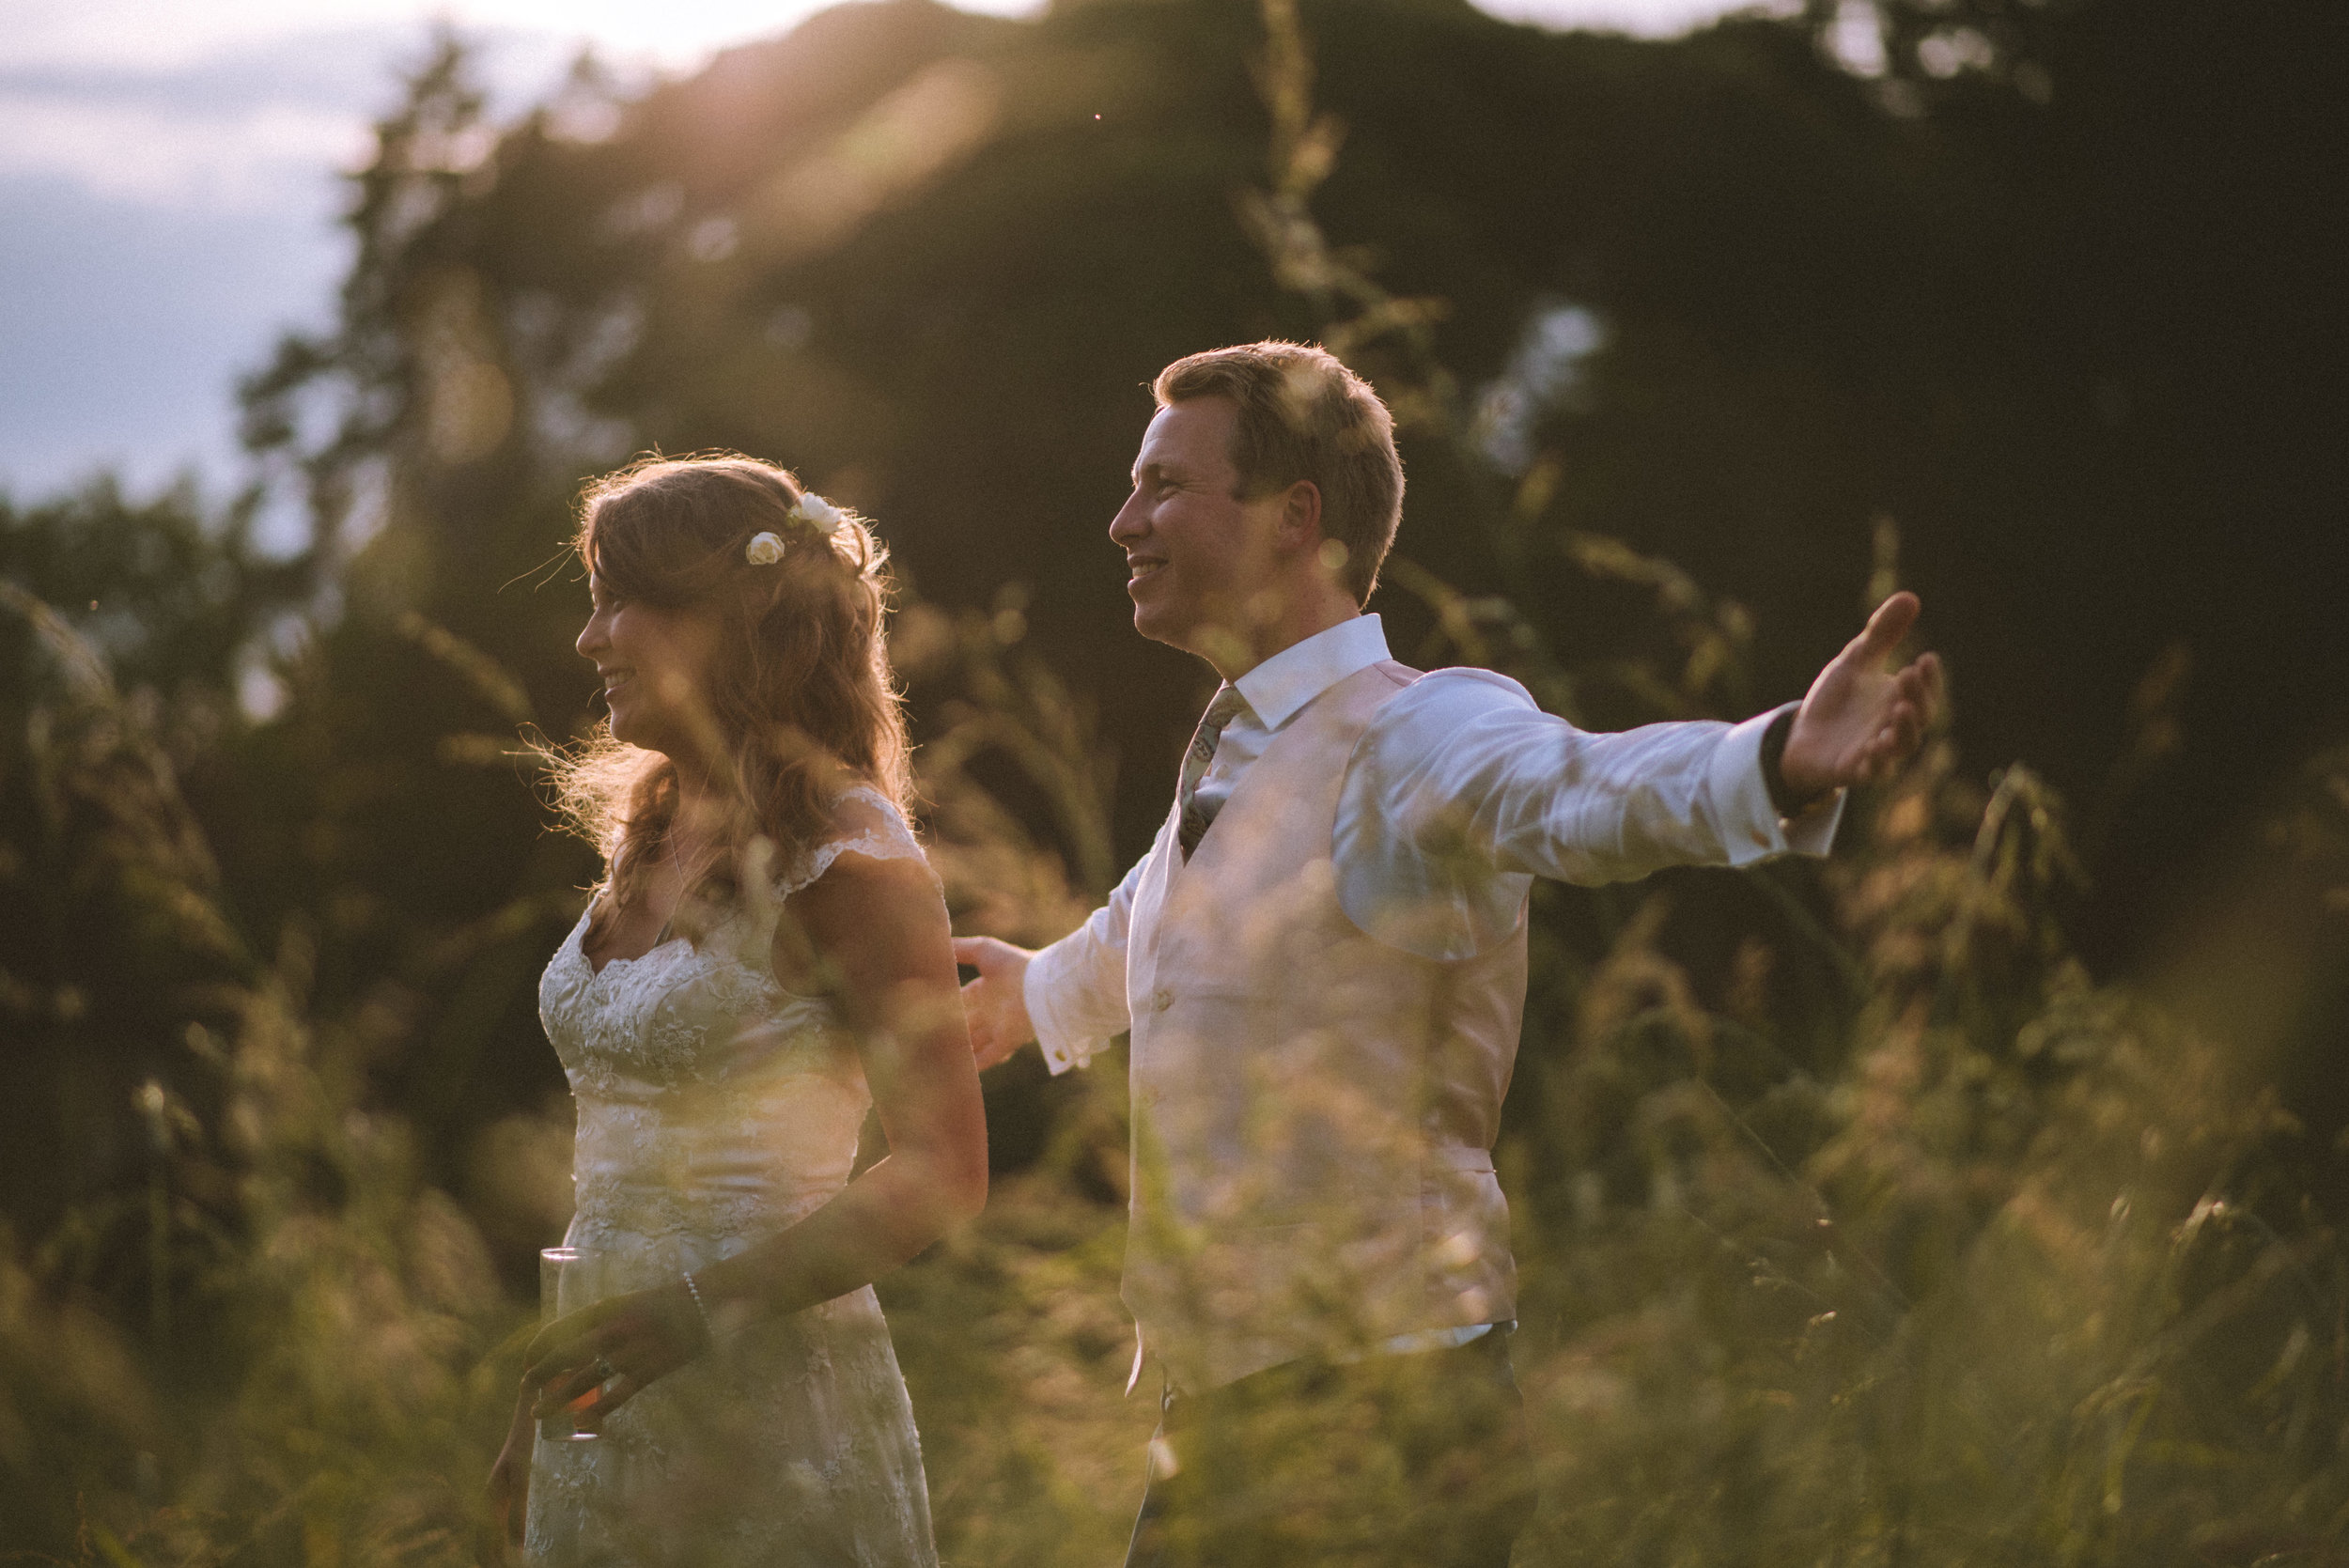 wedding-photographer-dordogne-mark-shaw-61.jpg